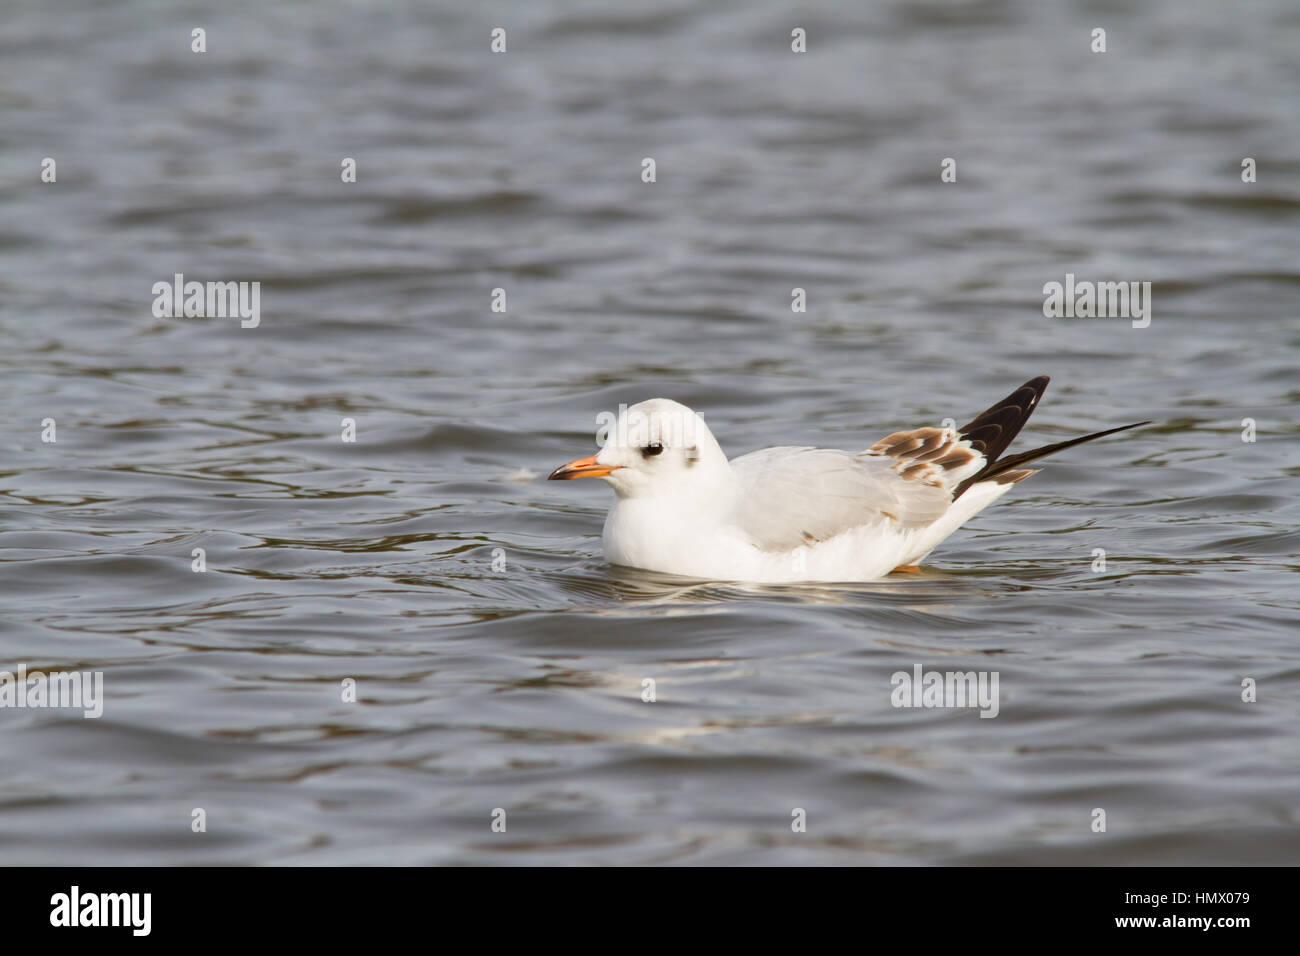 Black-headed Gull (Chroicocephalus ridibundus) swimming - Stock Image